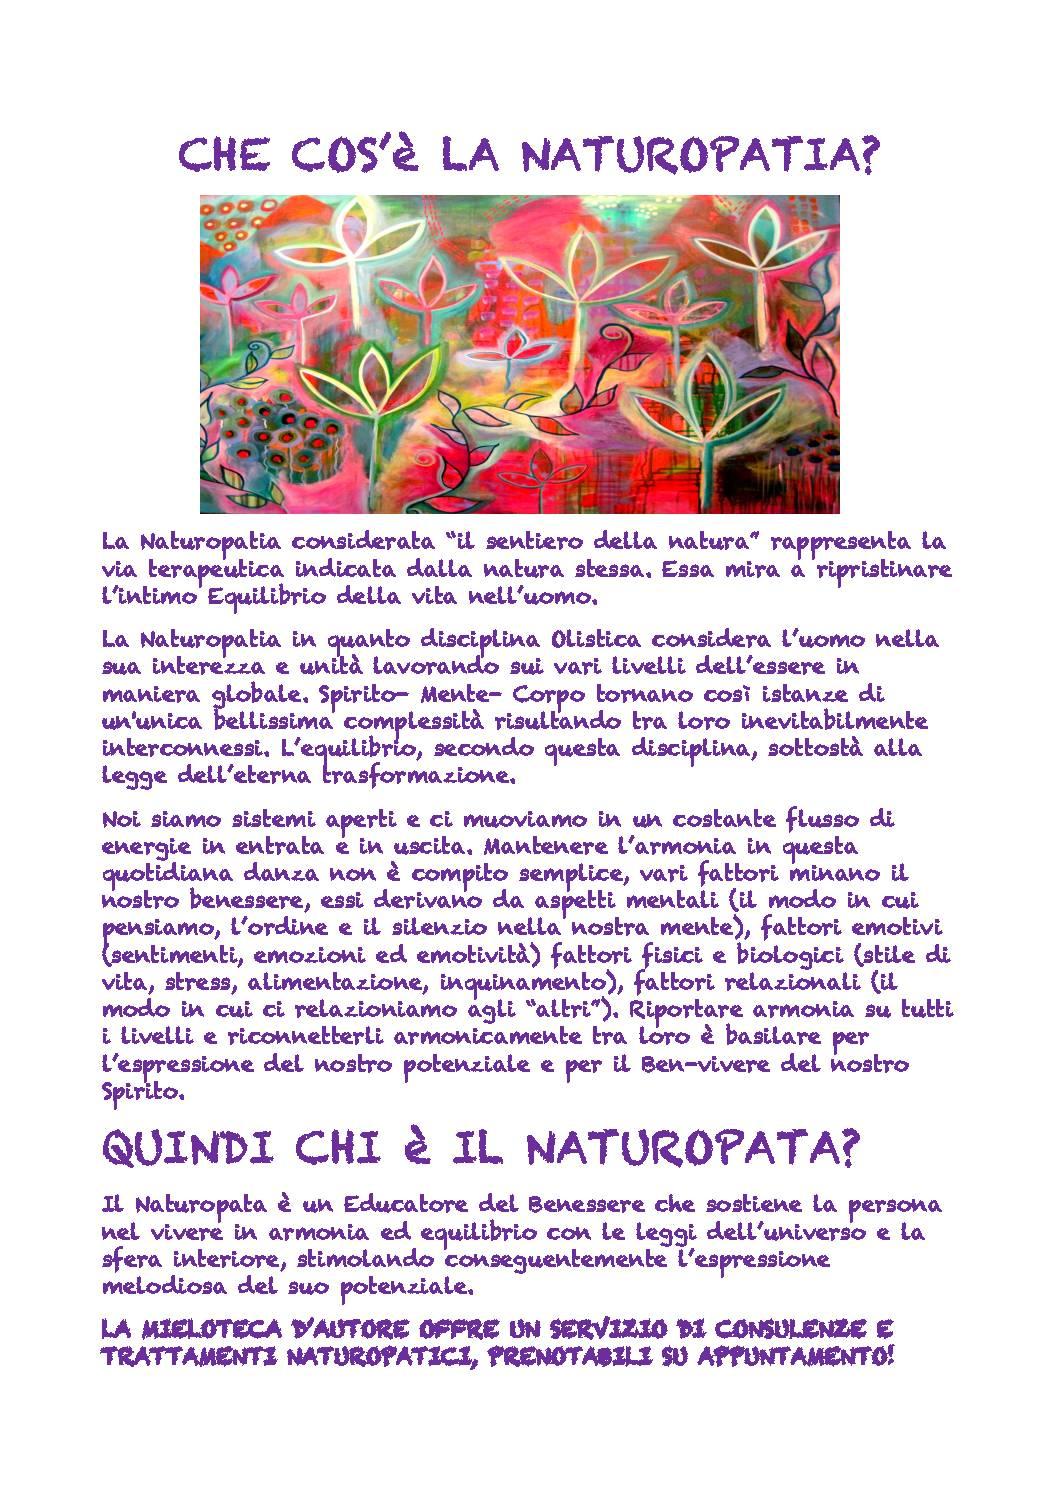 La naturopatia